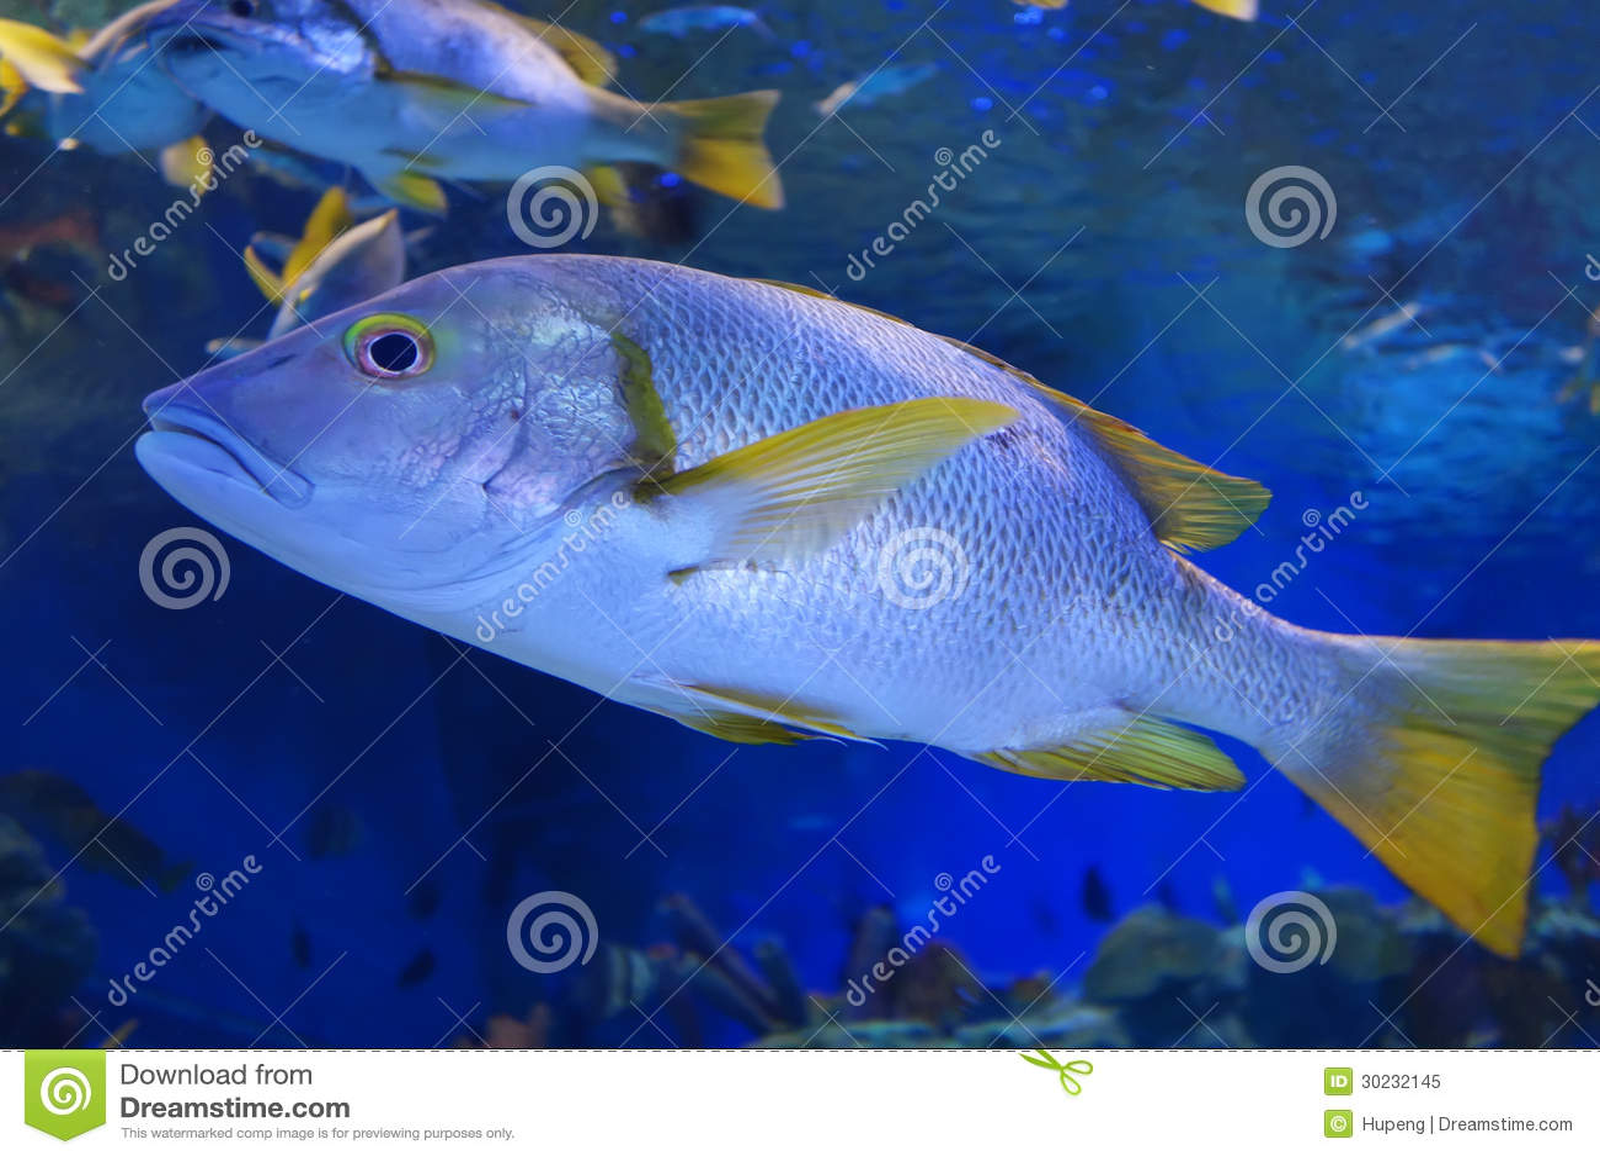 Ocean fish royalty free stock photo image 30232145 for Sea water fish